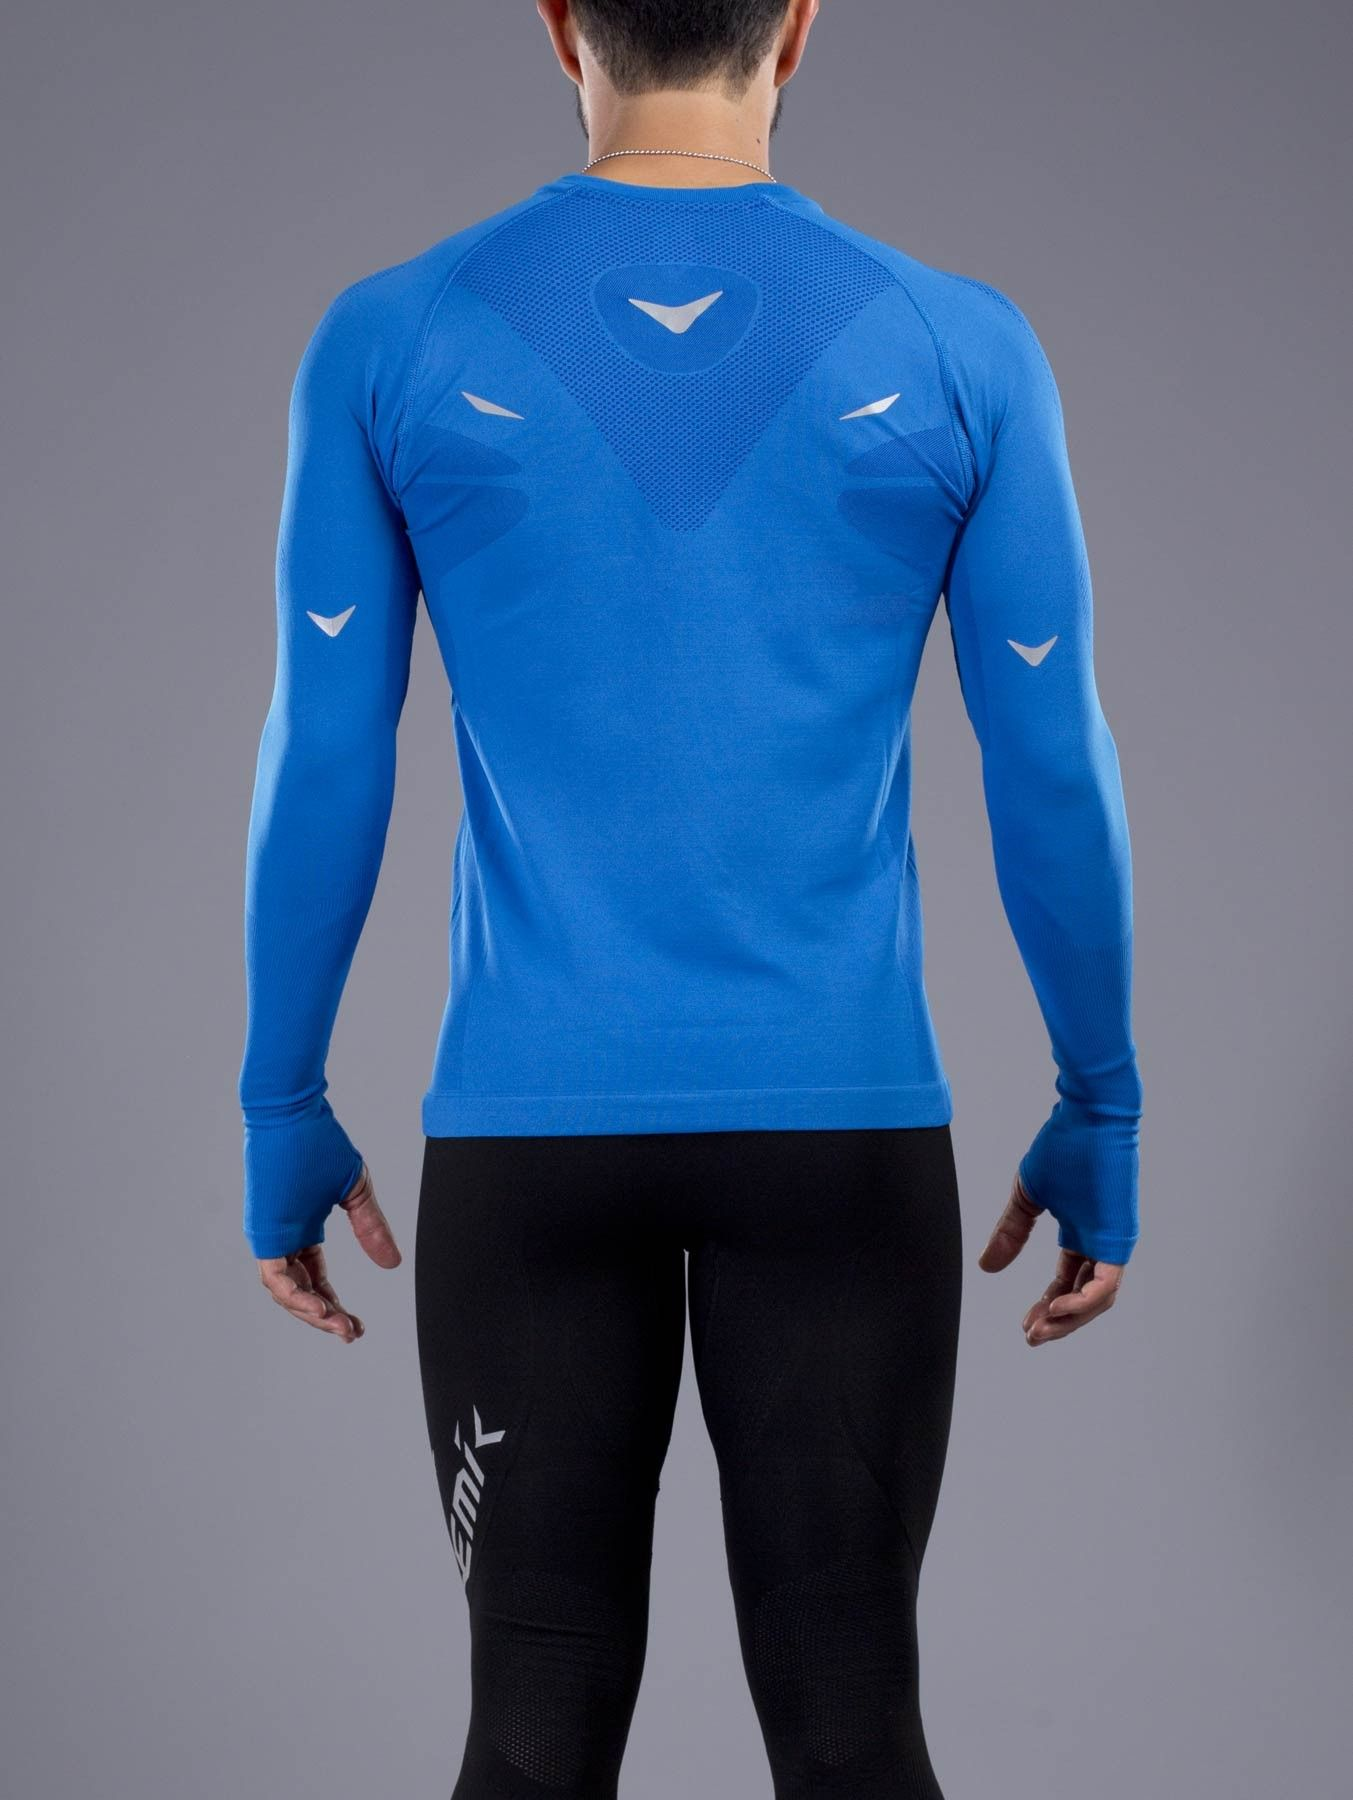 eff9b53a1bb PLAYERA DEPORTIVA MANGA LARGA CABALLERO Nemik #longsleeve #tshirt #blue  #Nemik